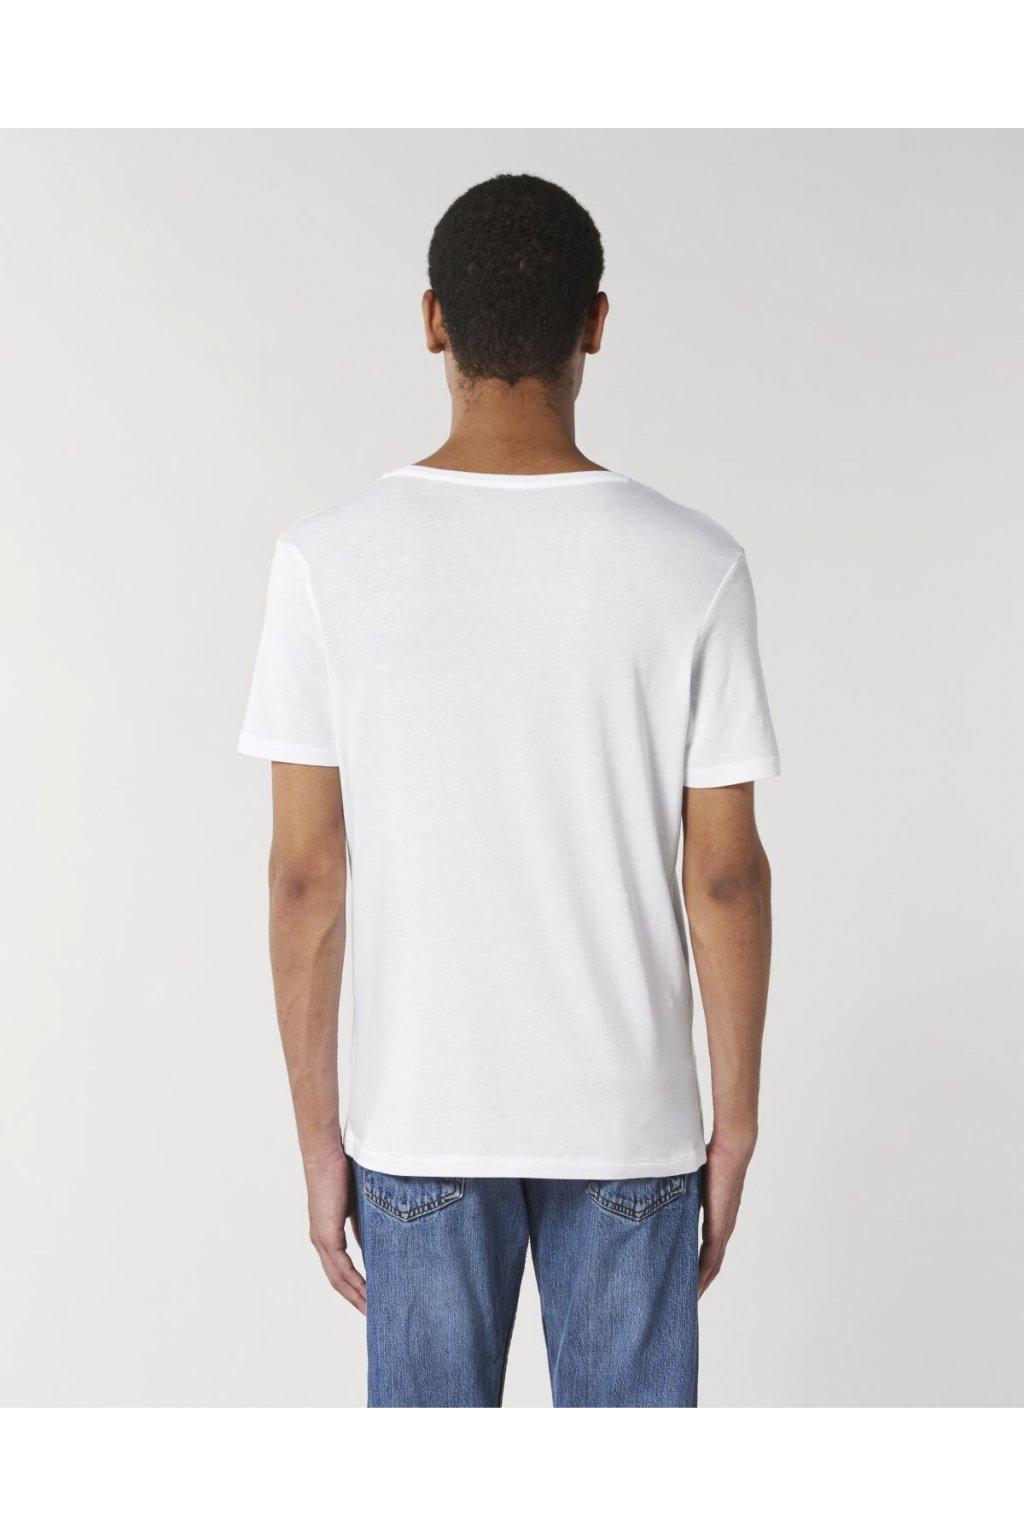 Stanley Enjoys Modal White Studio Front Main 0